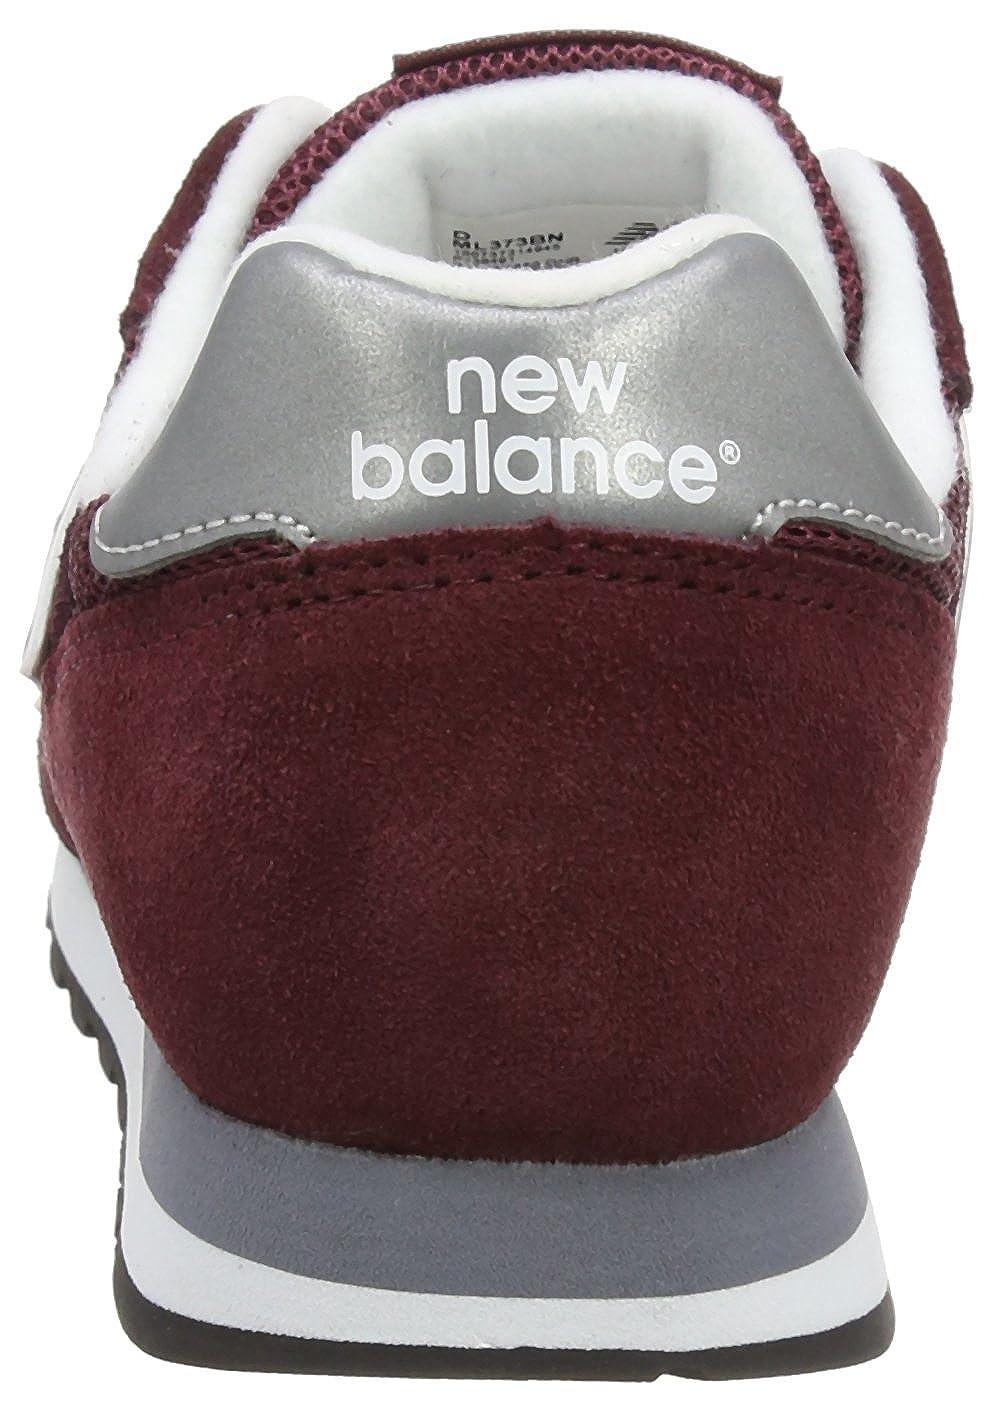 aceb1b740e51ff New Balance Men s 373 Core Trainers  Amazon.co.uk  Shoes   Bags